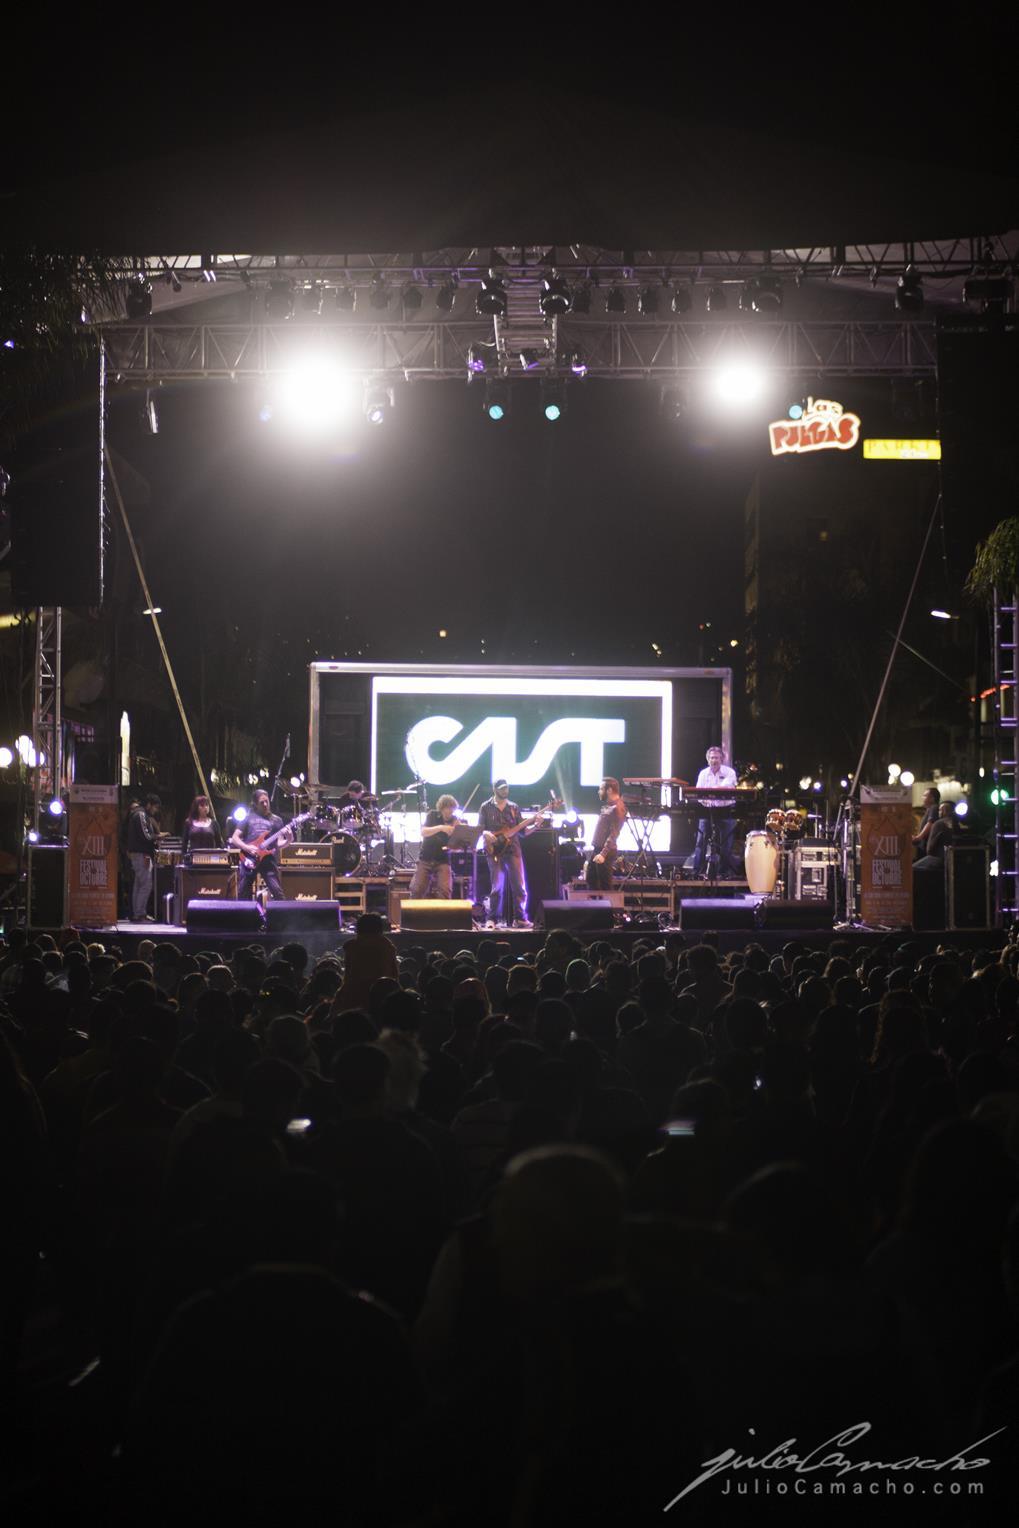 2014-10-30 31 CAST TOUR Ensenada y Tijuana - 1447 - www.Juli (Copy).jpg